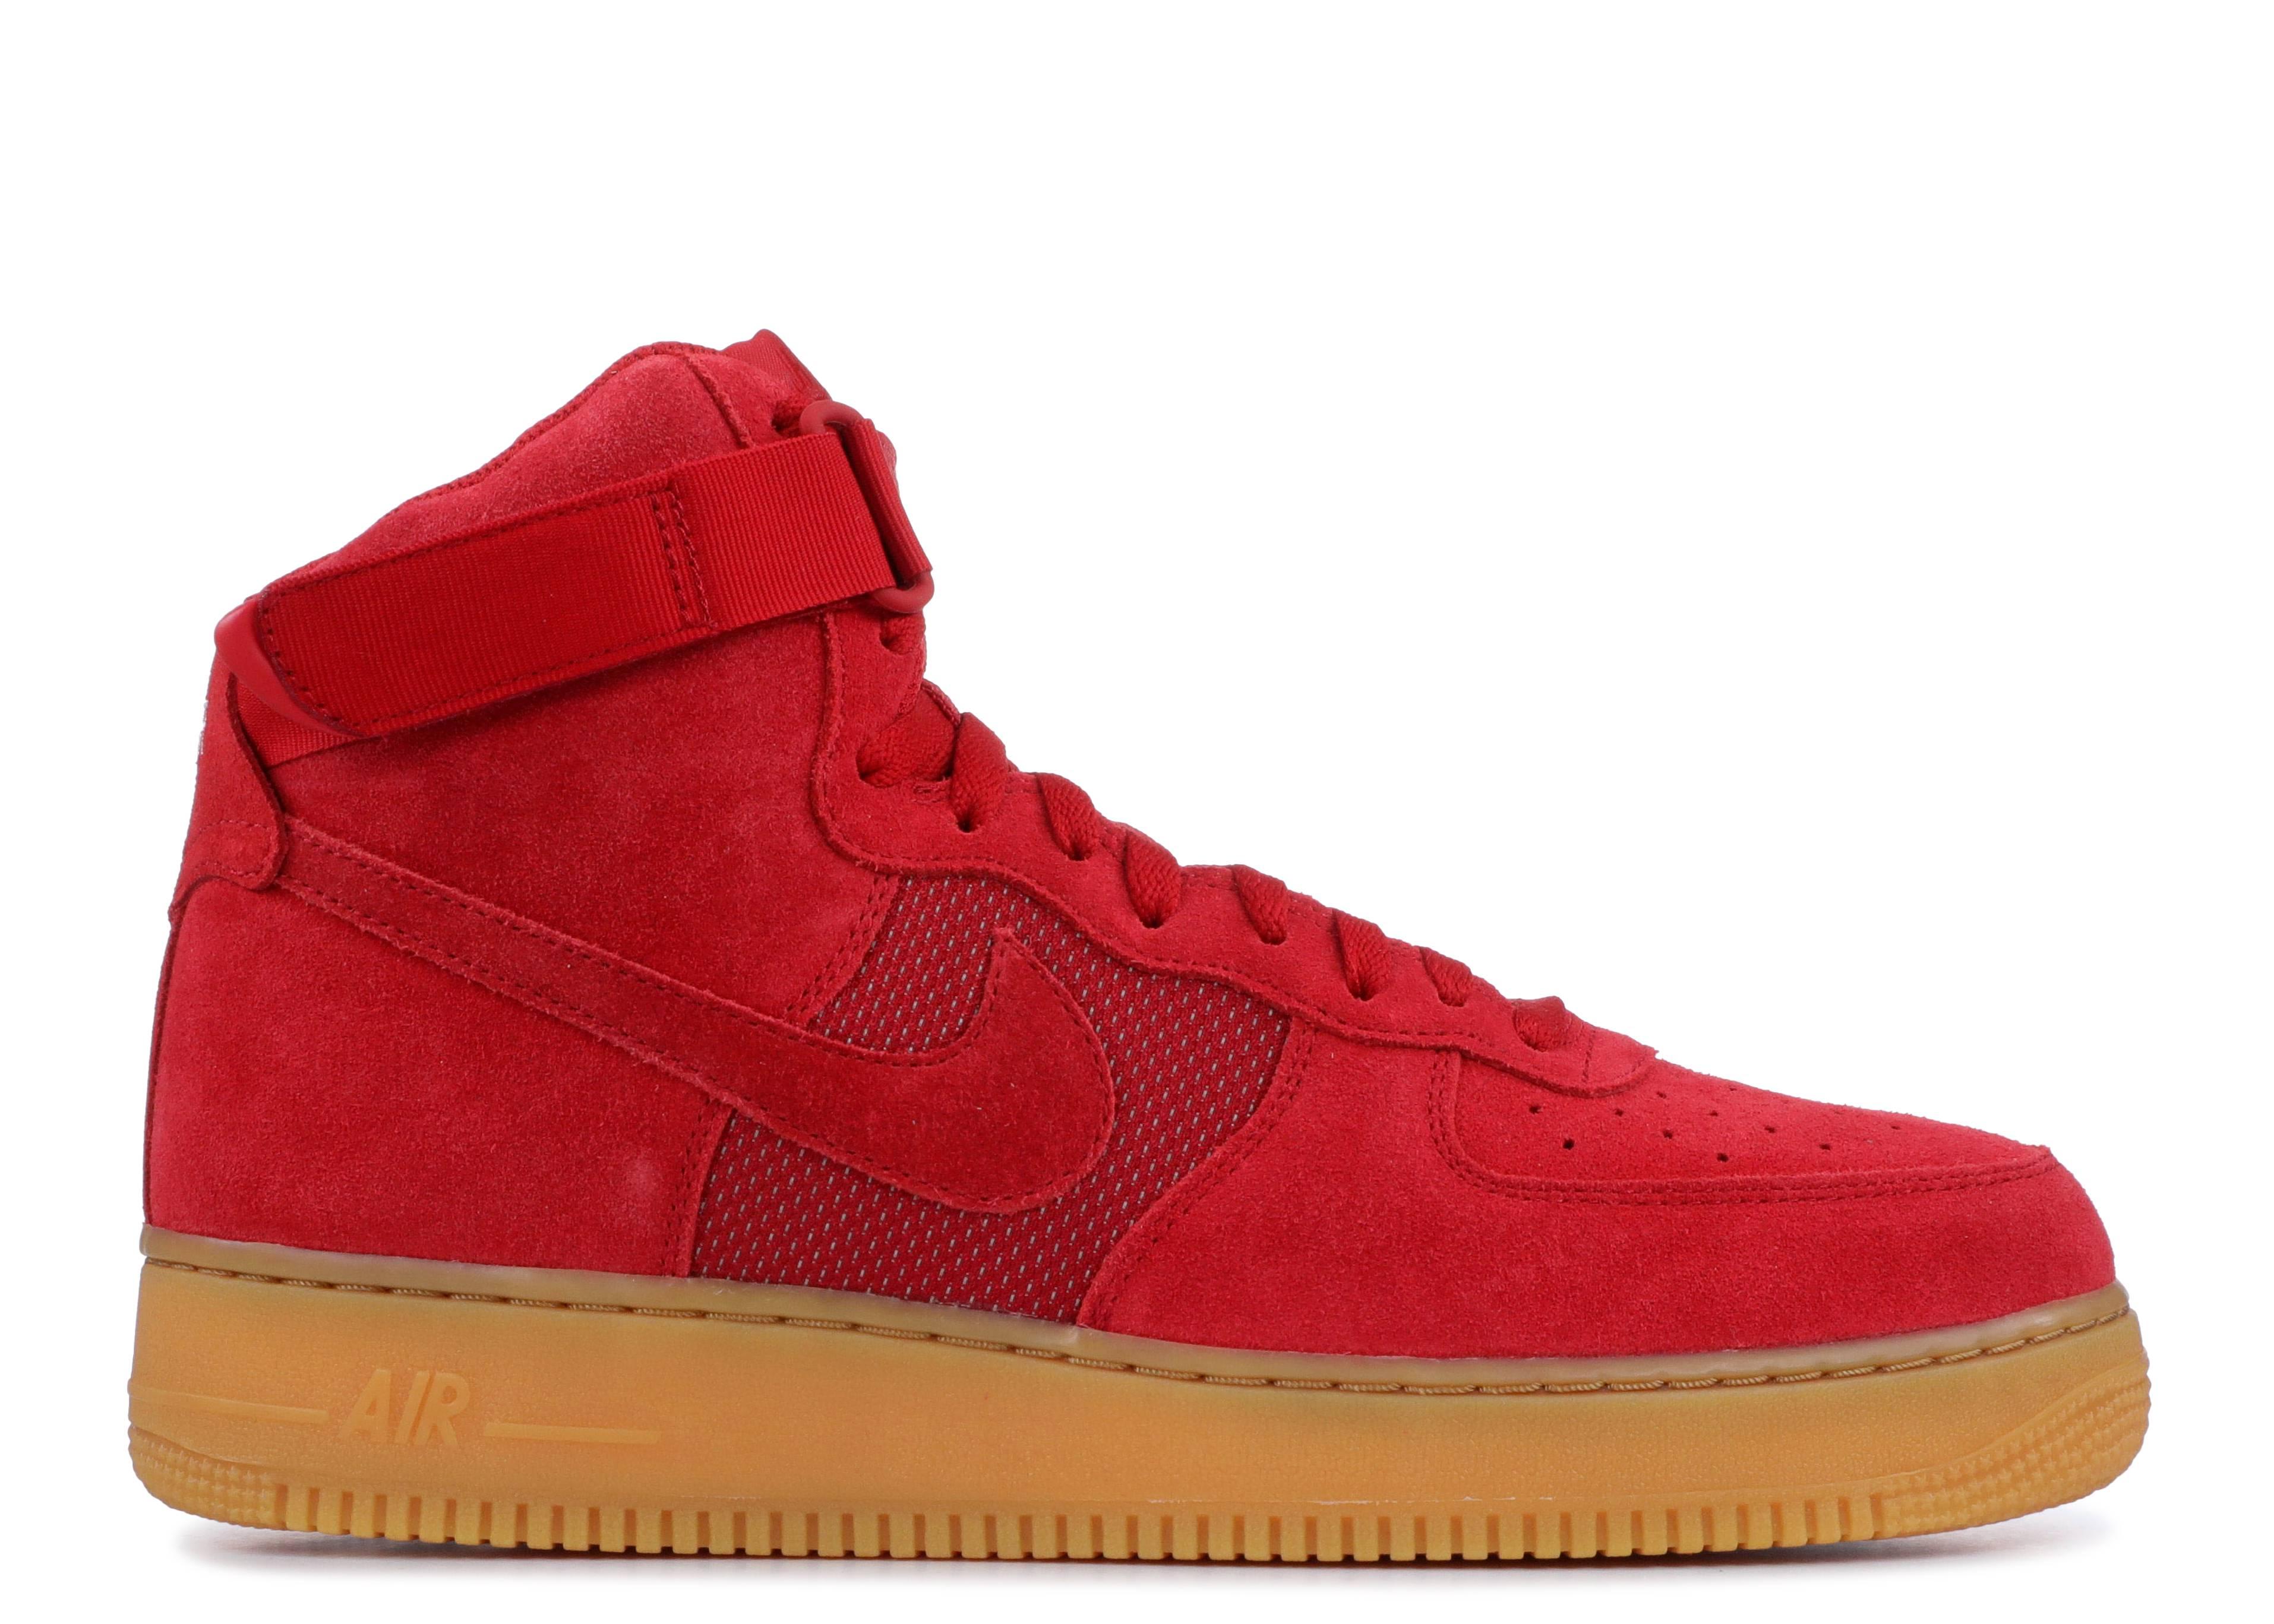 Nike Air Force 1 High Gym Red Gum 806403 601   SneakerFiles